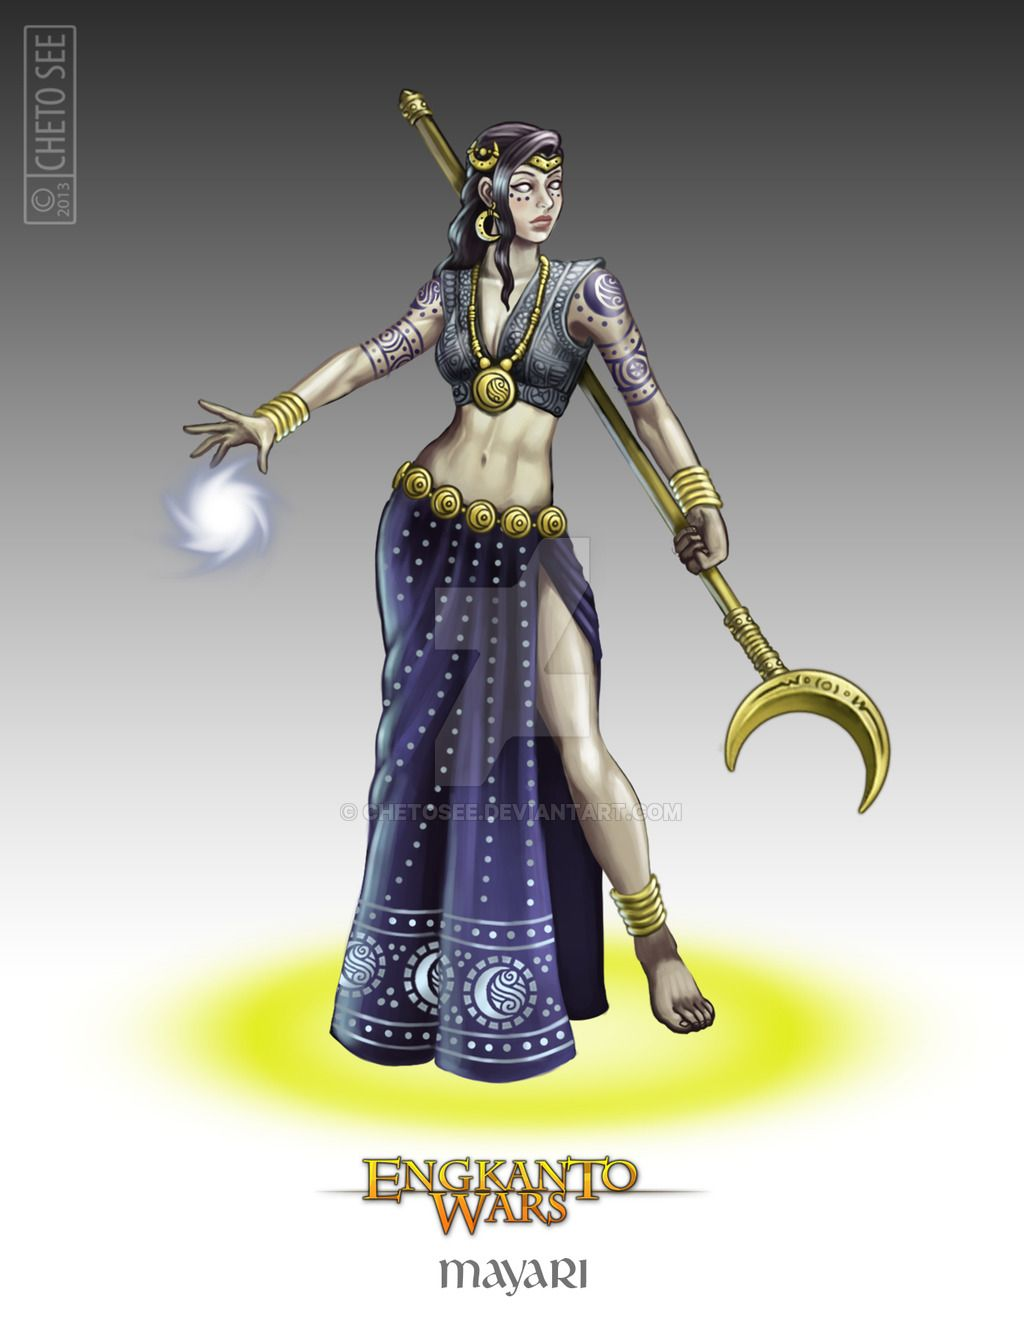 Mayari by chetosee on DeviantArt | Philippine mythology